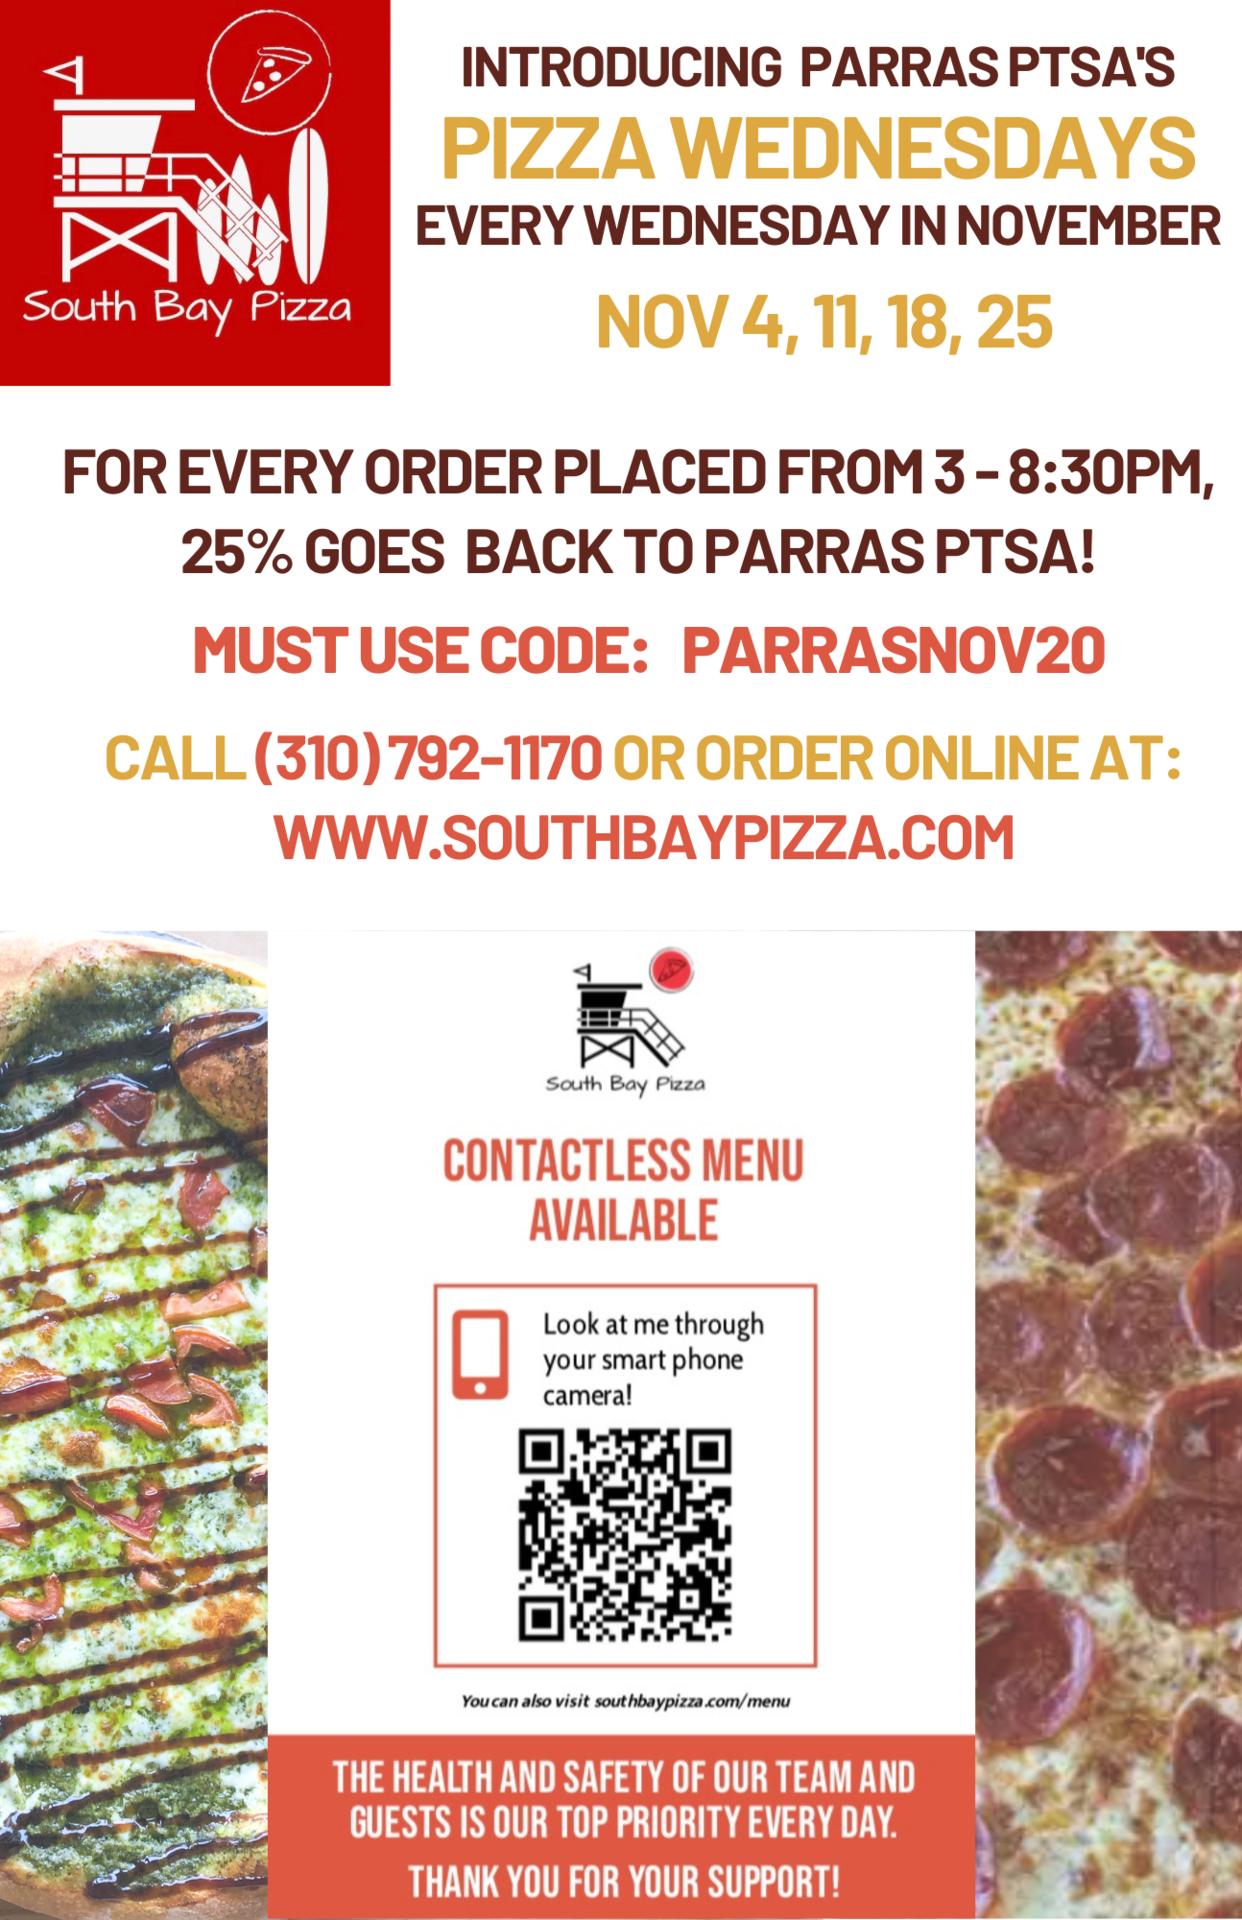 South Bay Pizza